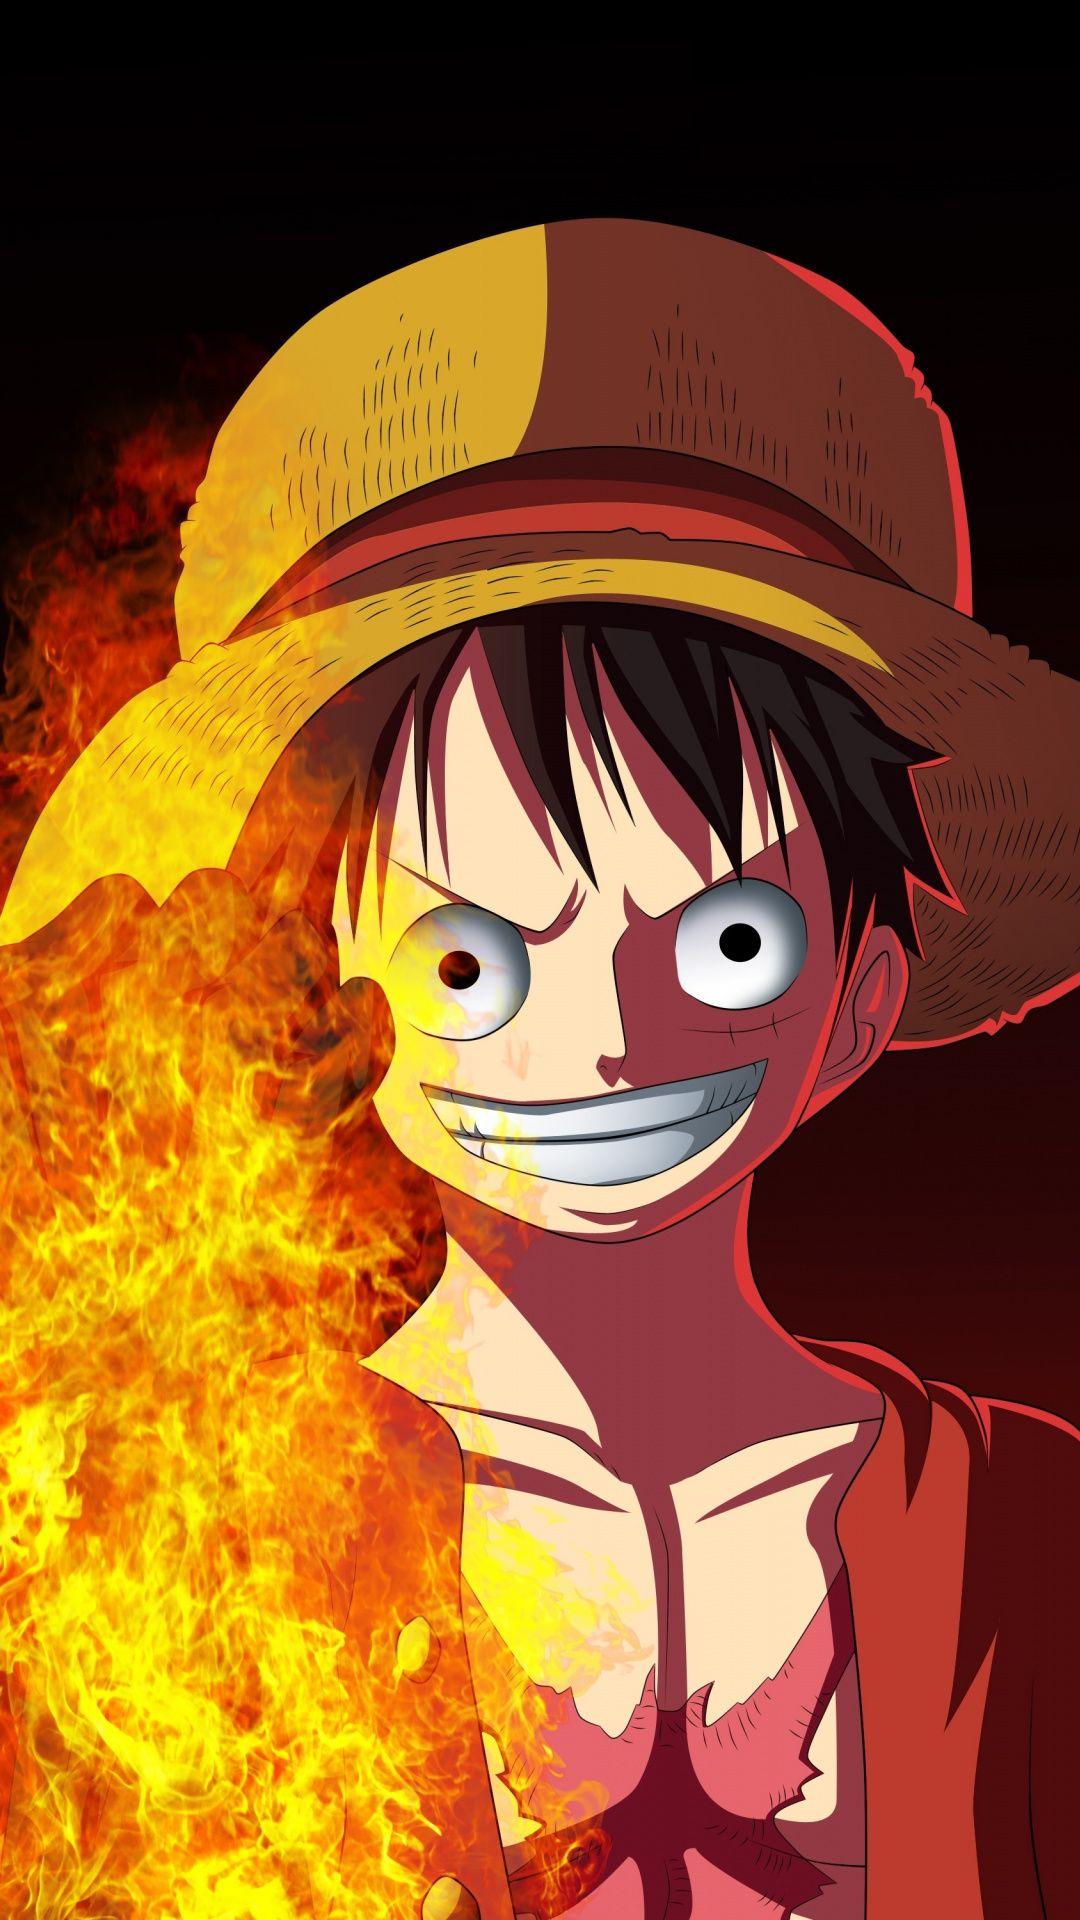 Monkey Anime Boy Curious One Piece 1080x1920 Wallpaper One Piece Luffy Anime Anime Wallpaper